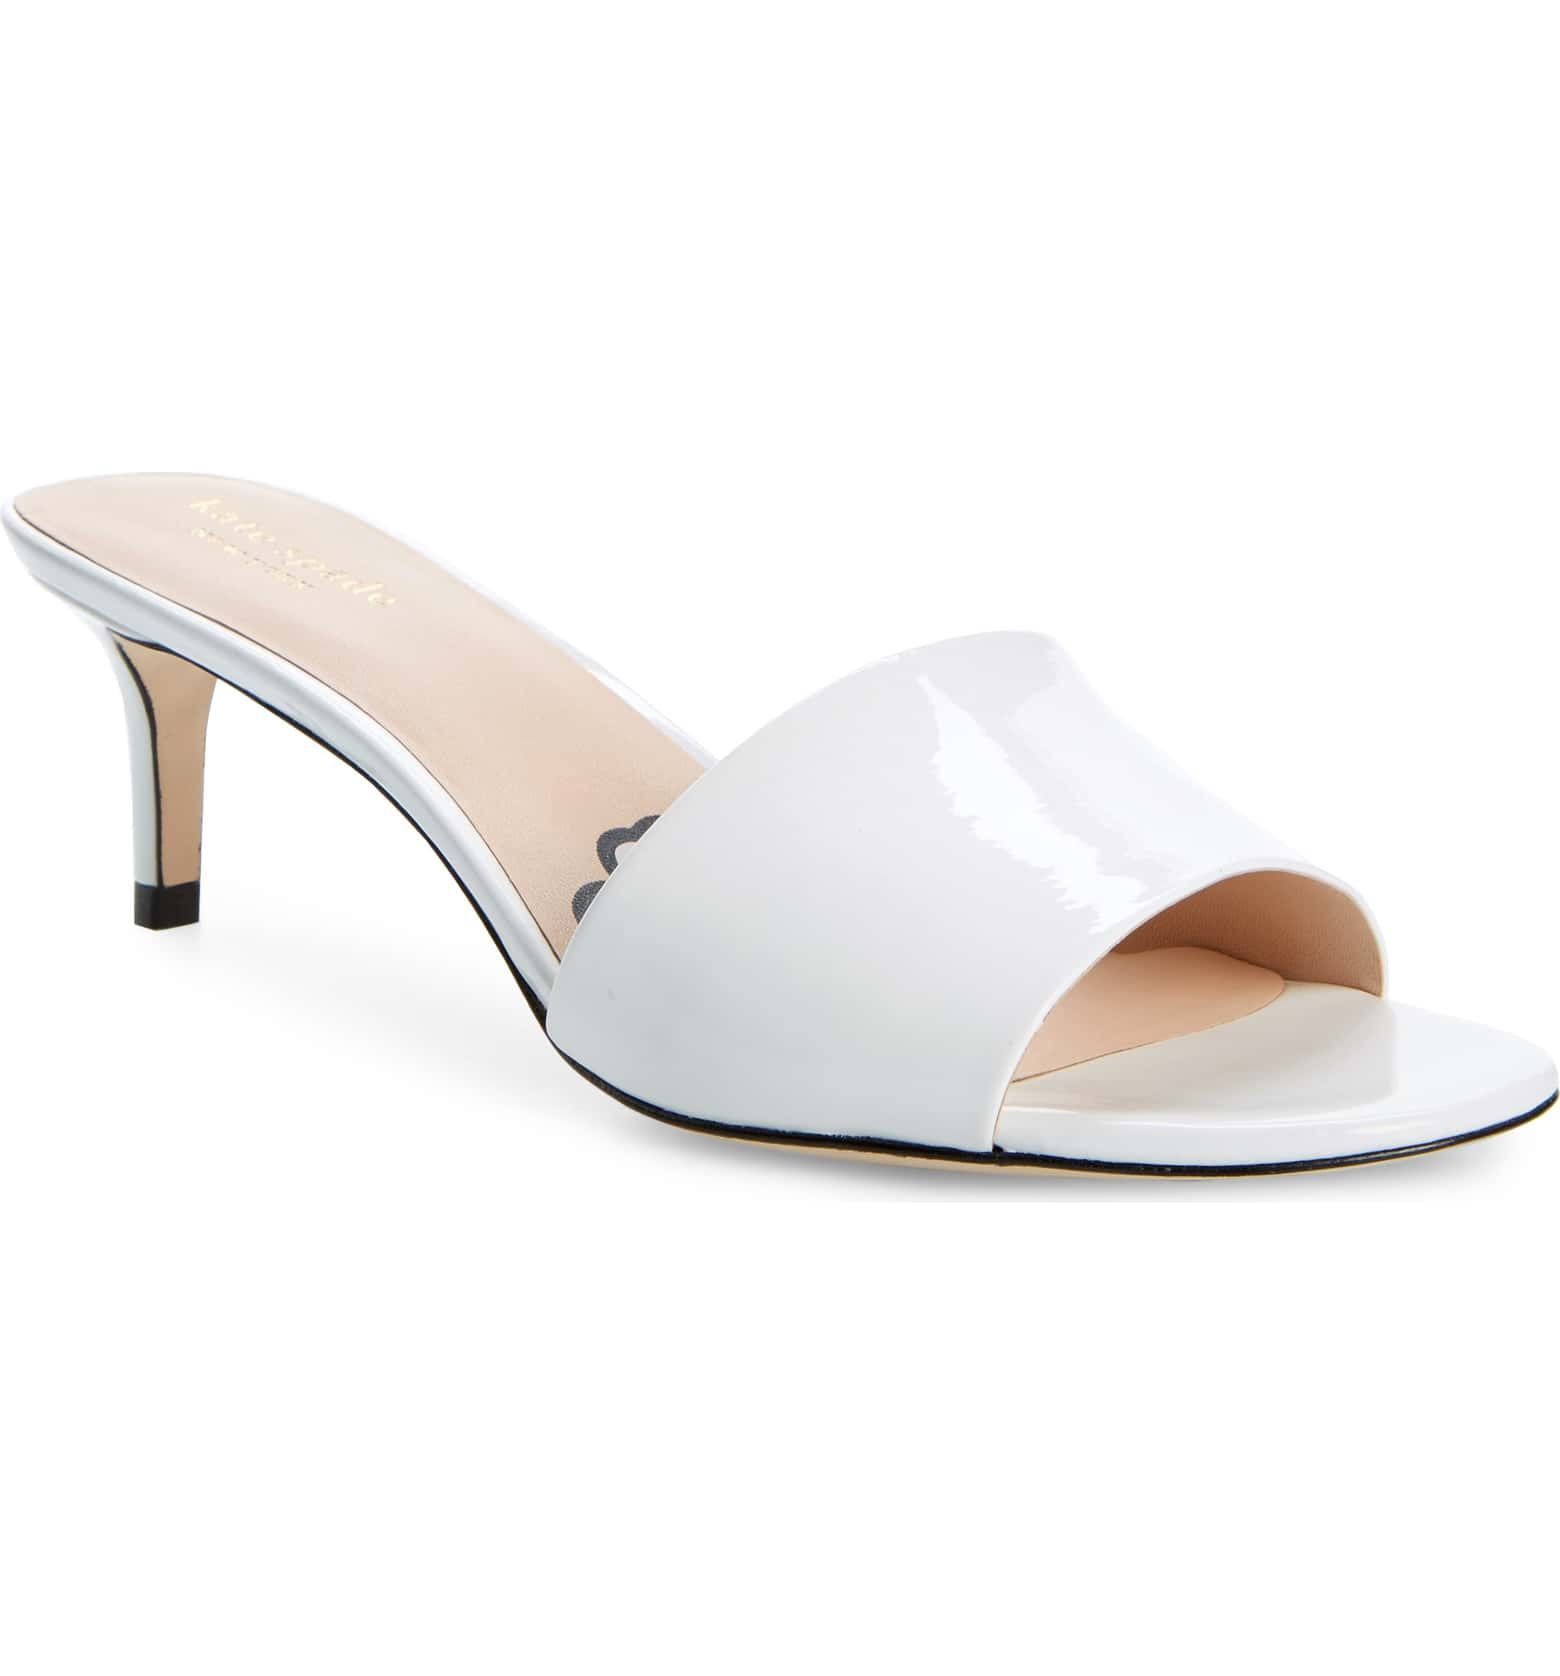 0d3f4fad9 kate spade new york savvi slide sandal (Women) | Nordstrom | STYLES ...